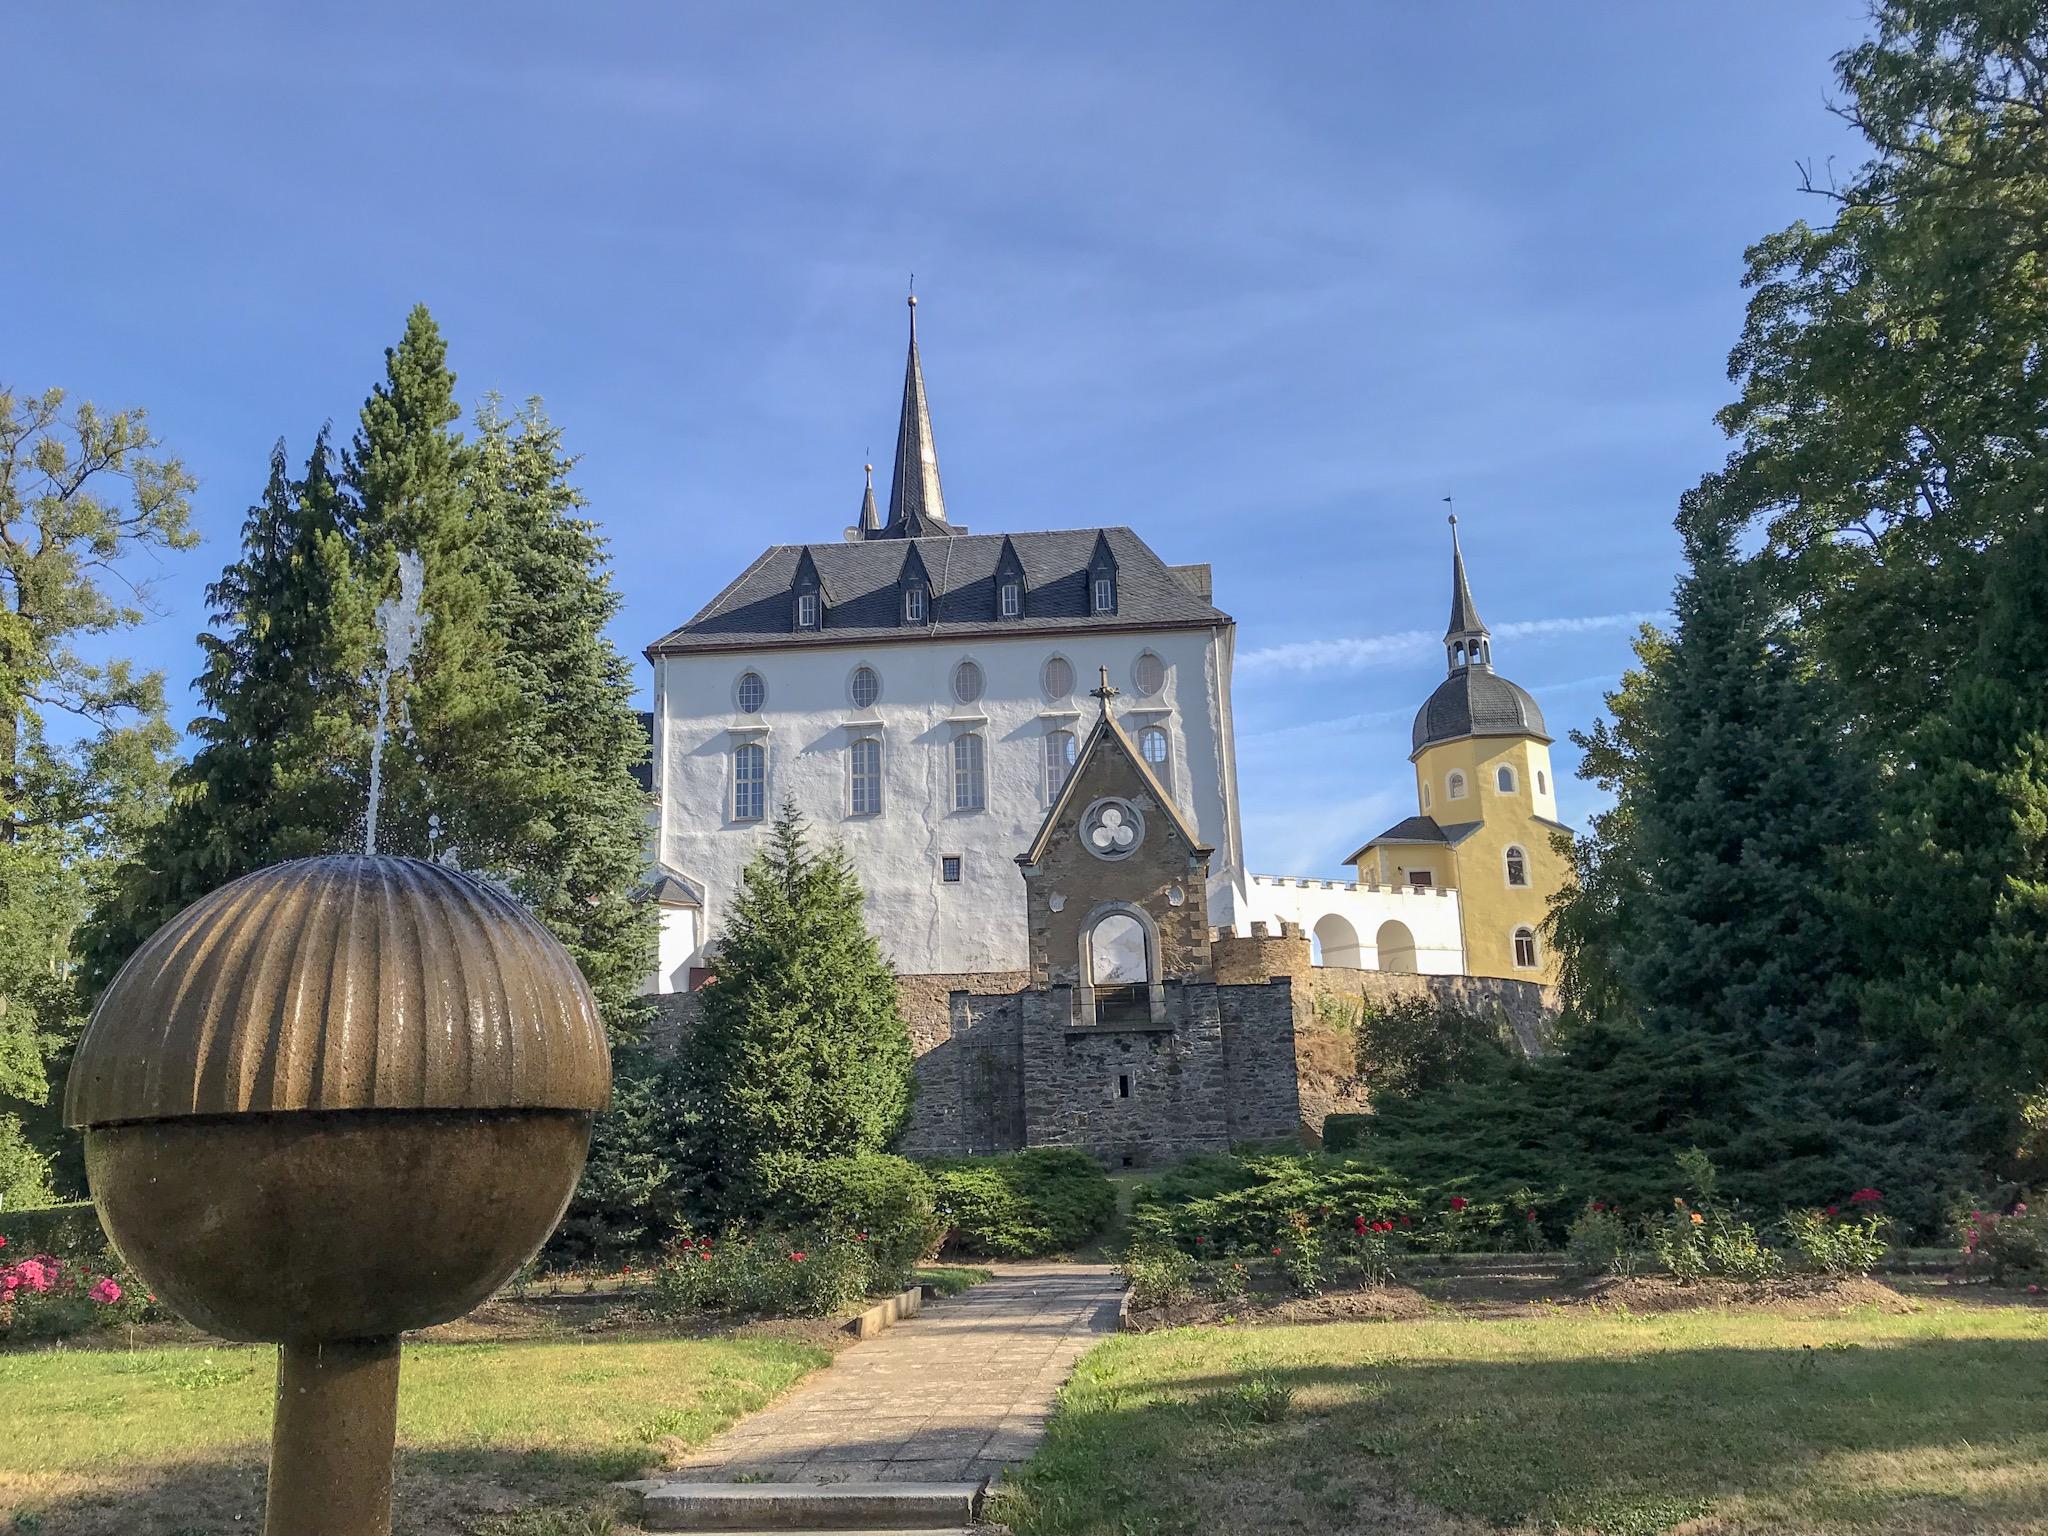 Neuhausen, Germany